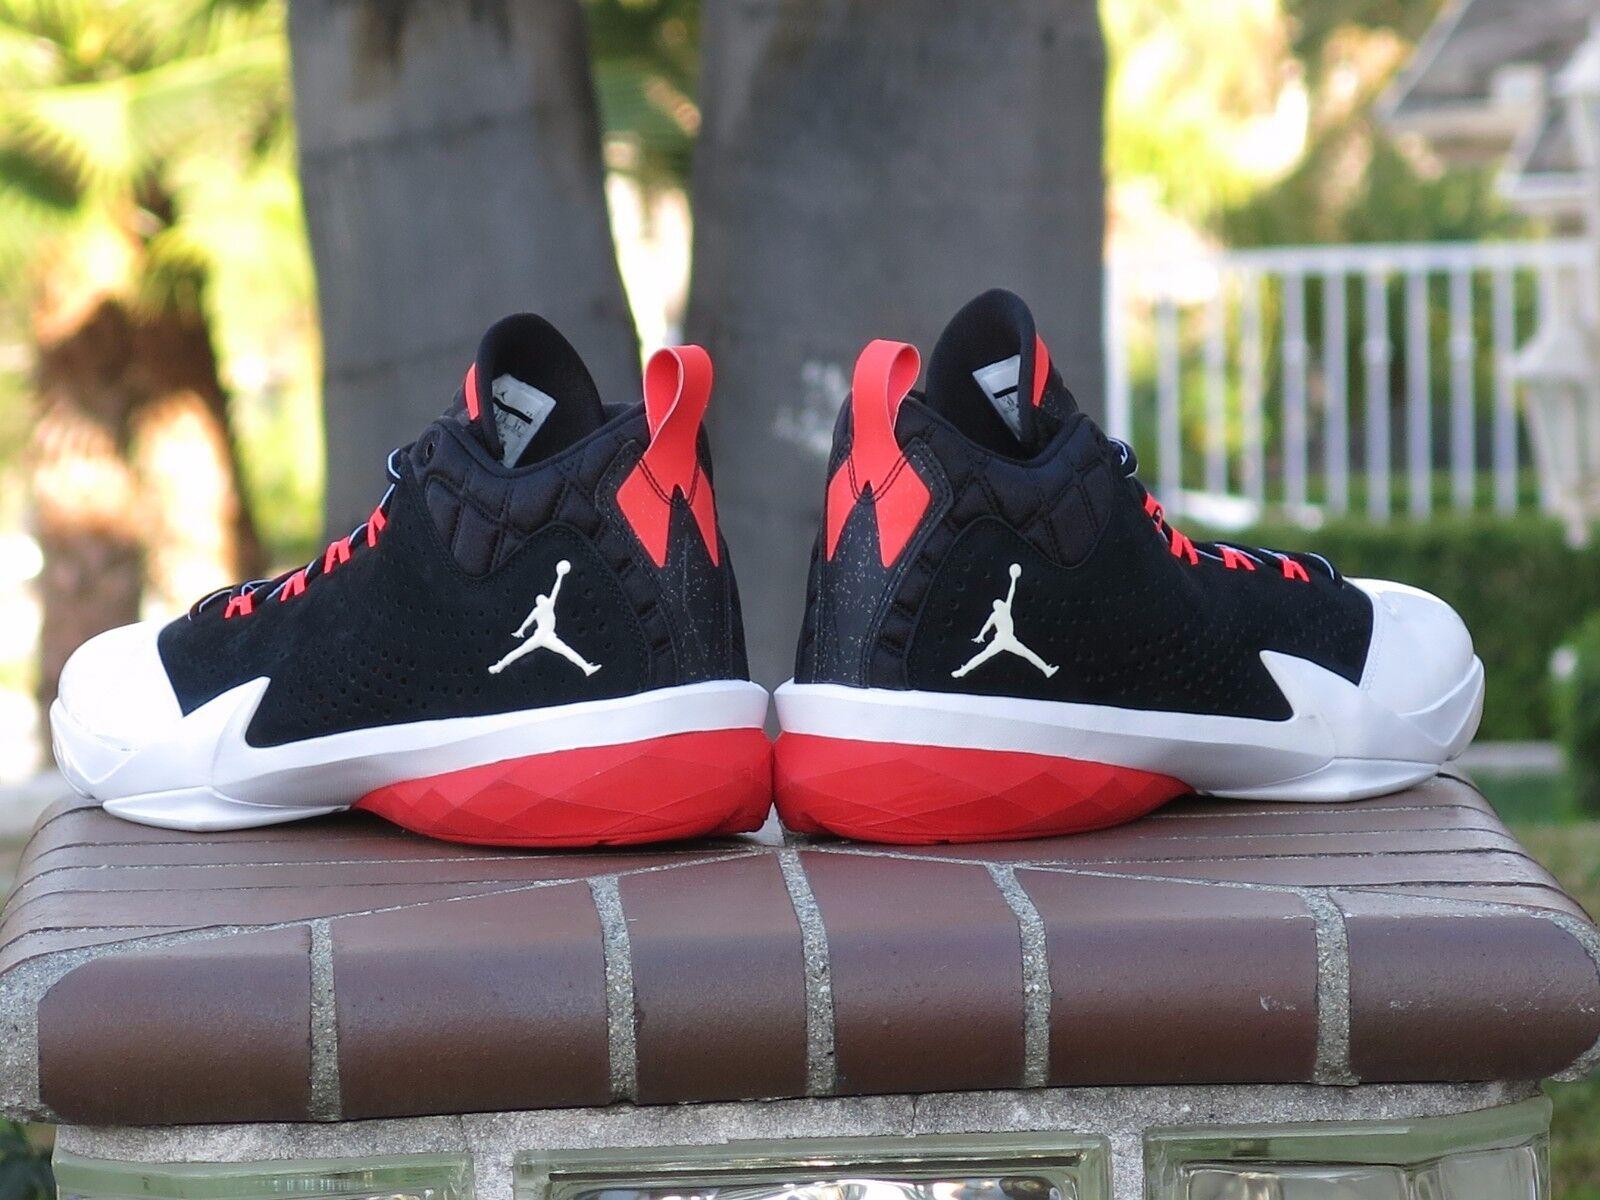 Nike air jordan flugzeit ist ist ist basketball - schuhe 654272-021 sz. 8f7643